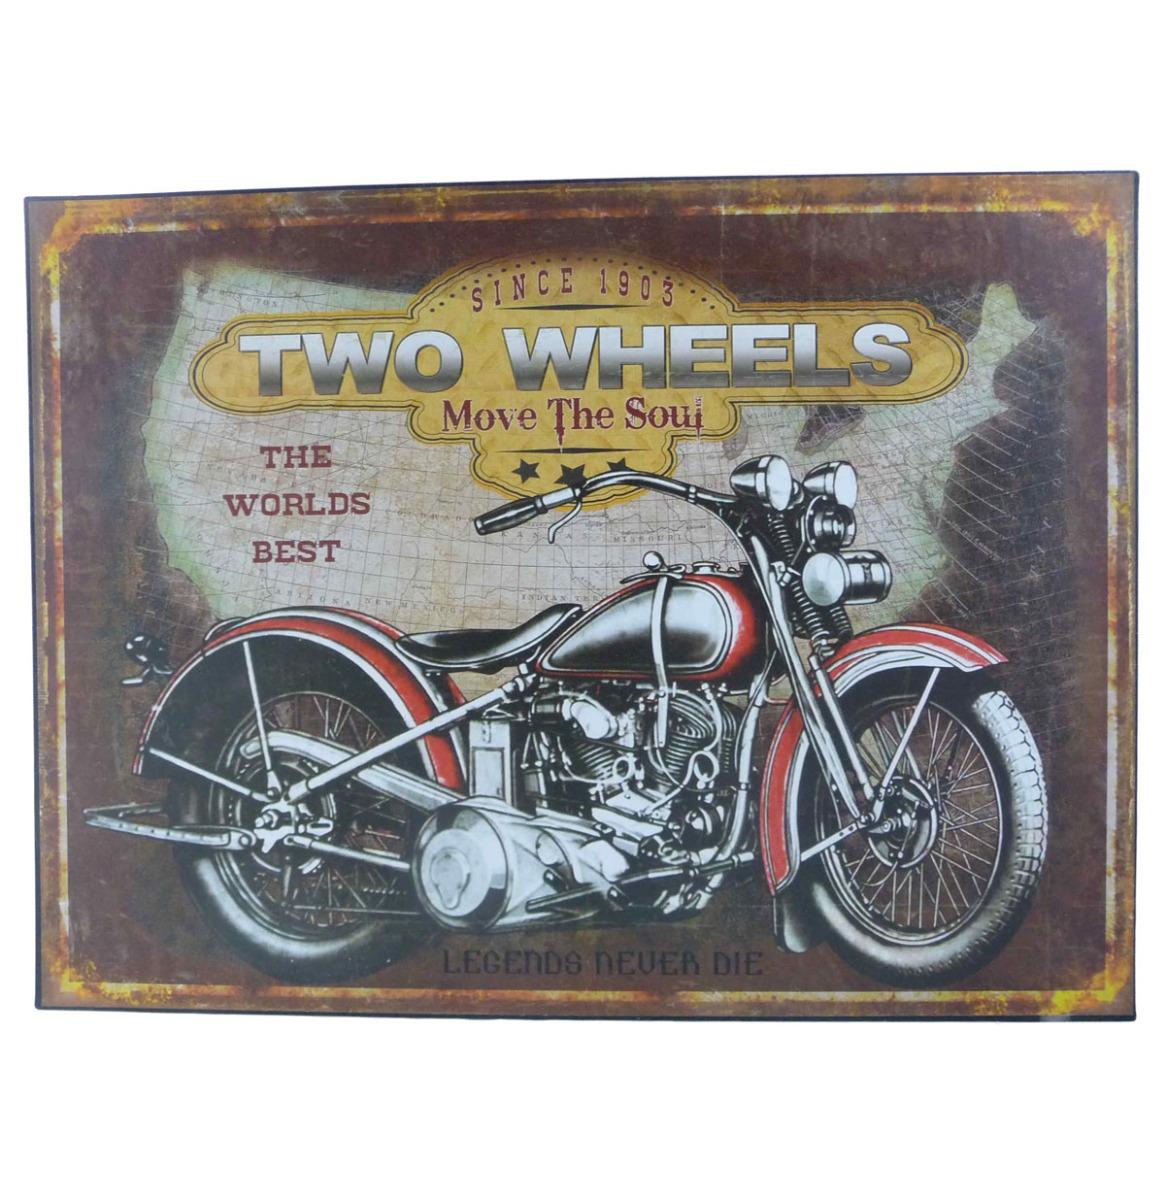 Biker Two Wheels, Move The Soul Stalen Bord 30 x 40 cm